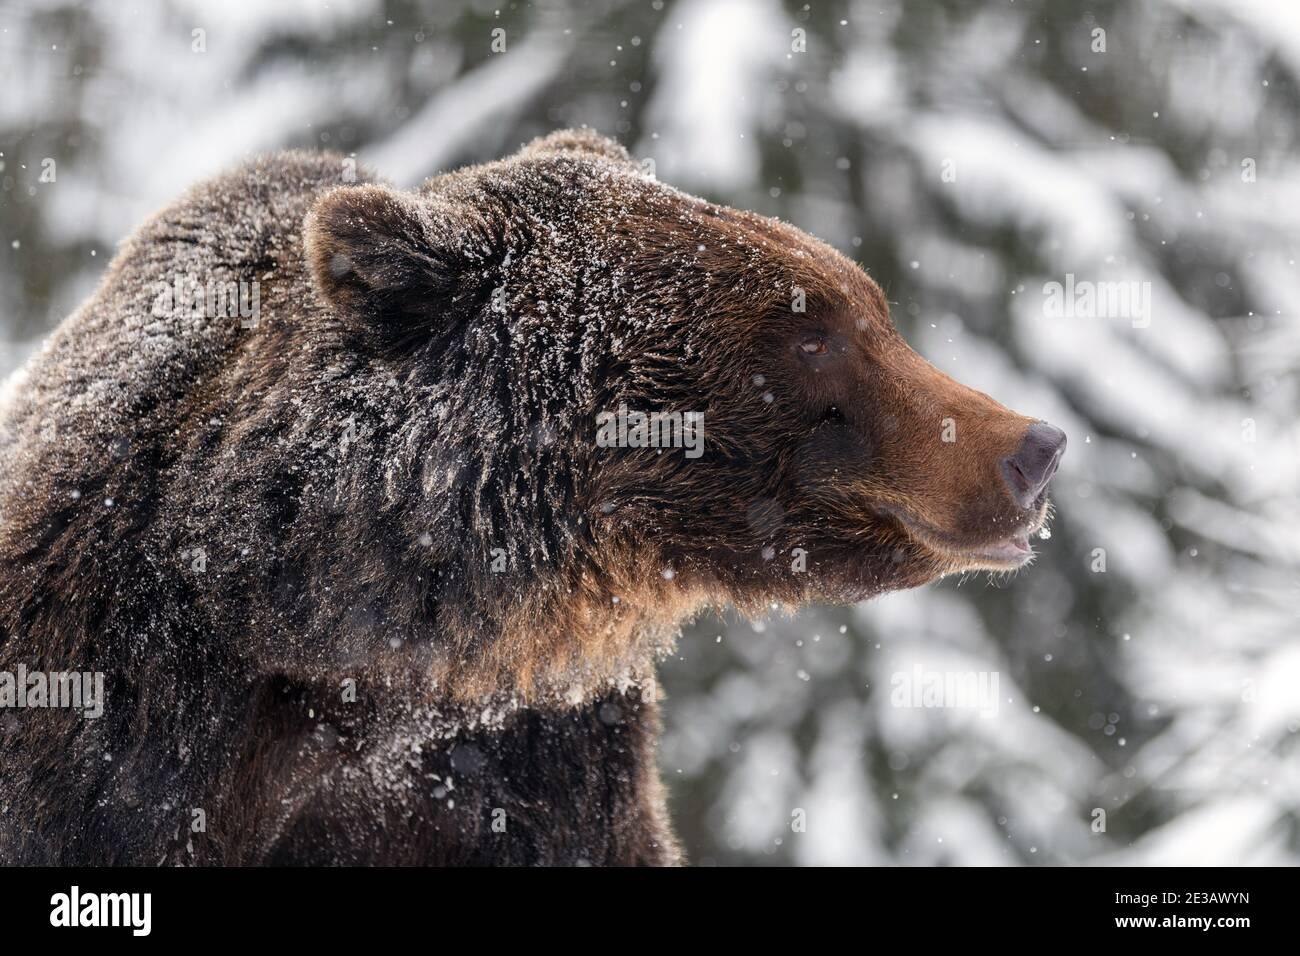 Close wild big brown bear portrait in winter forest. Danger animal in nature habitat. Big mammal. Wildlife scene Stock Photo